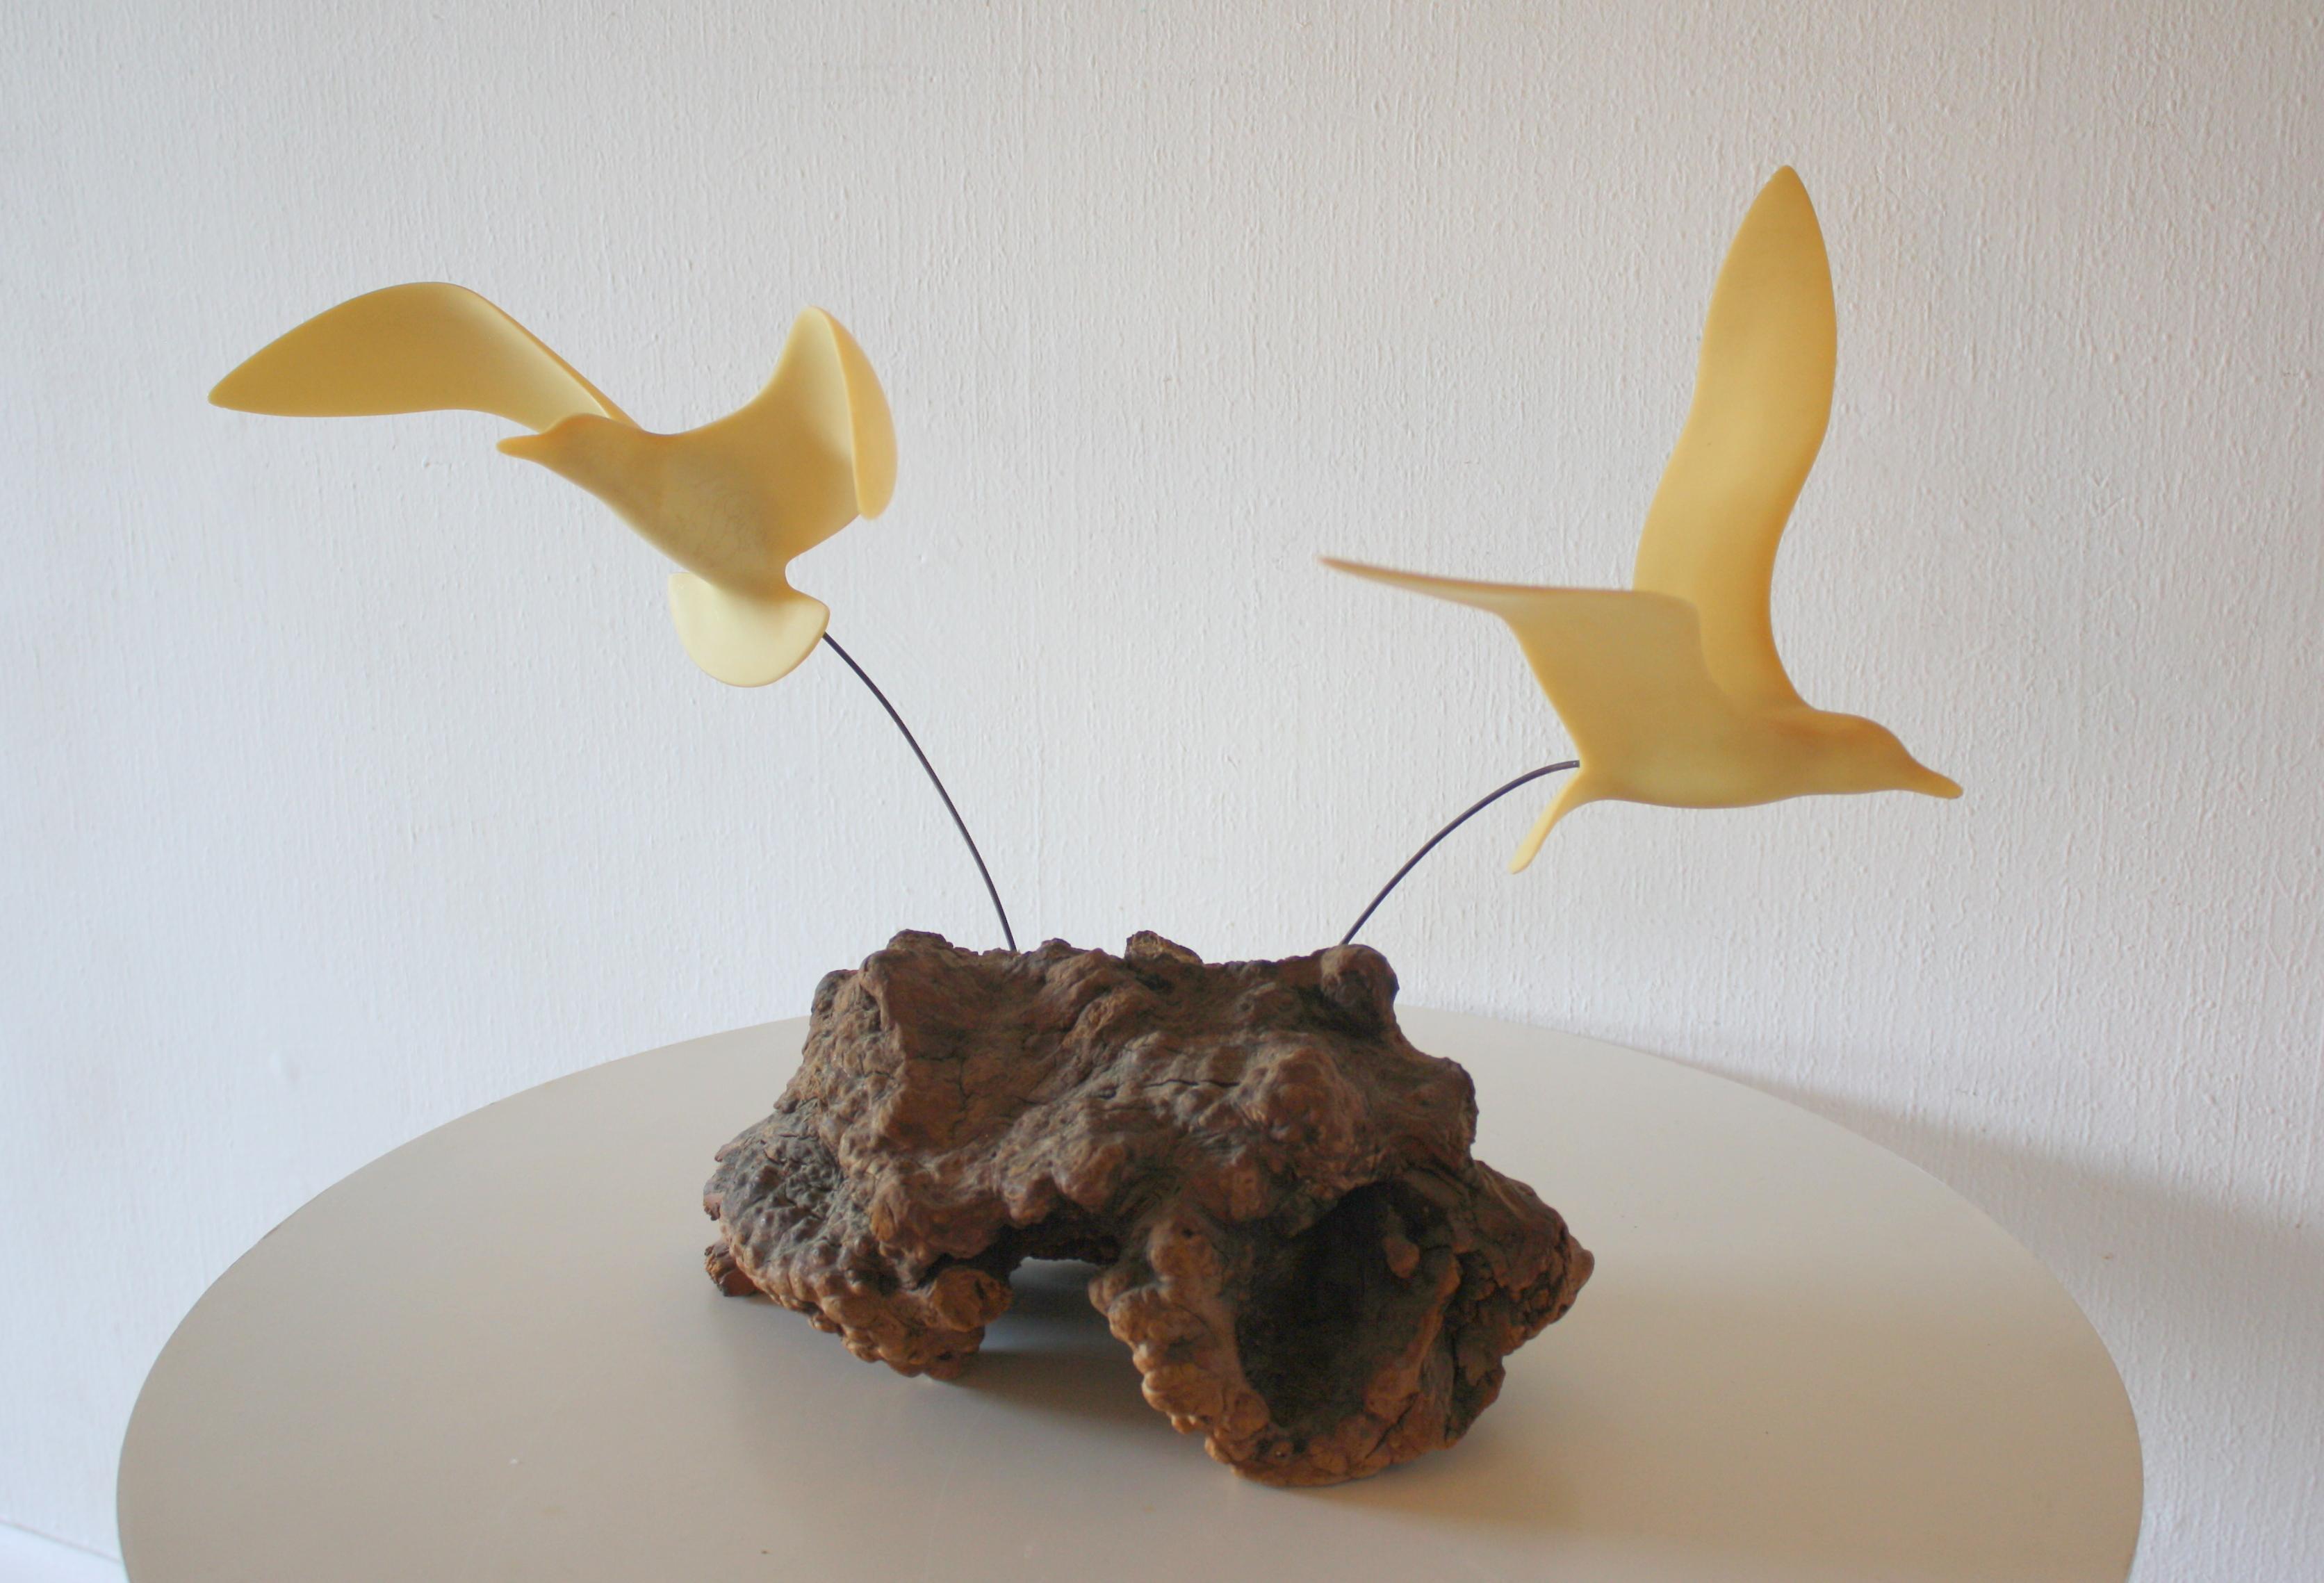 burl sculoture with birds 1.JPG